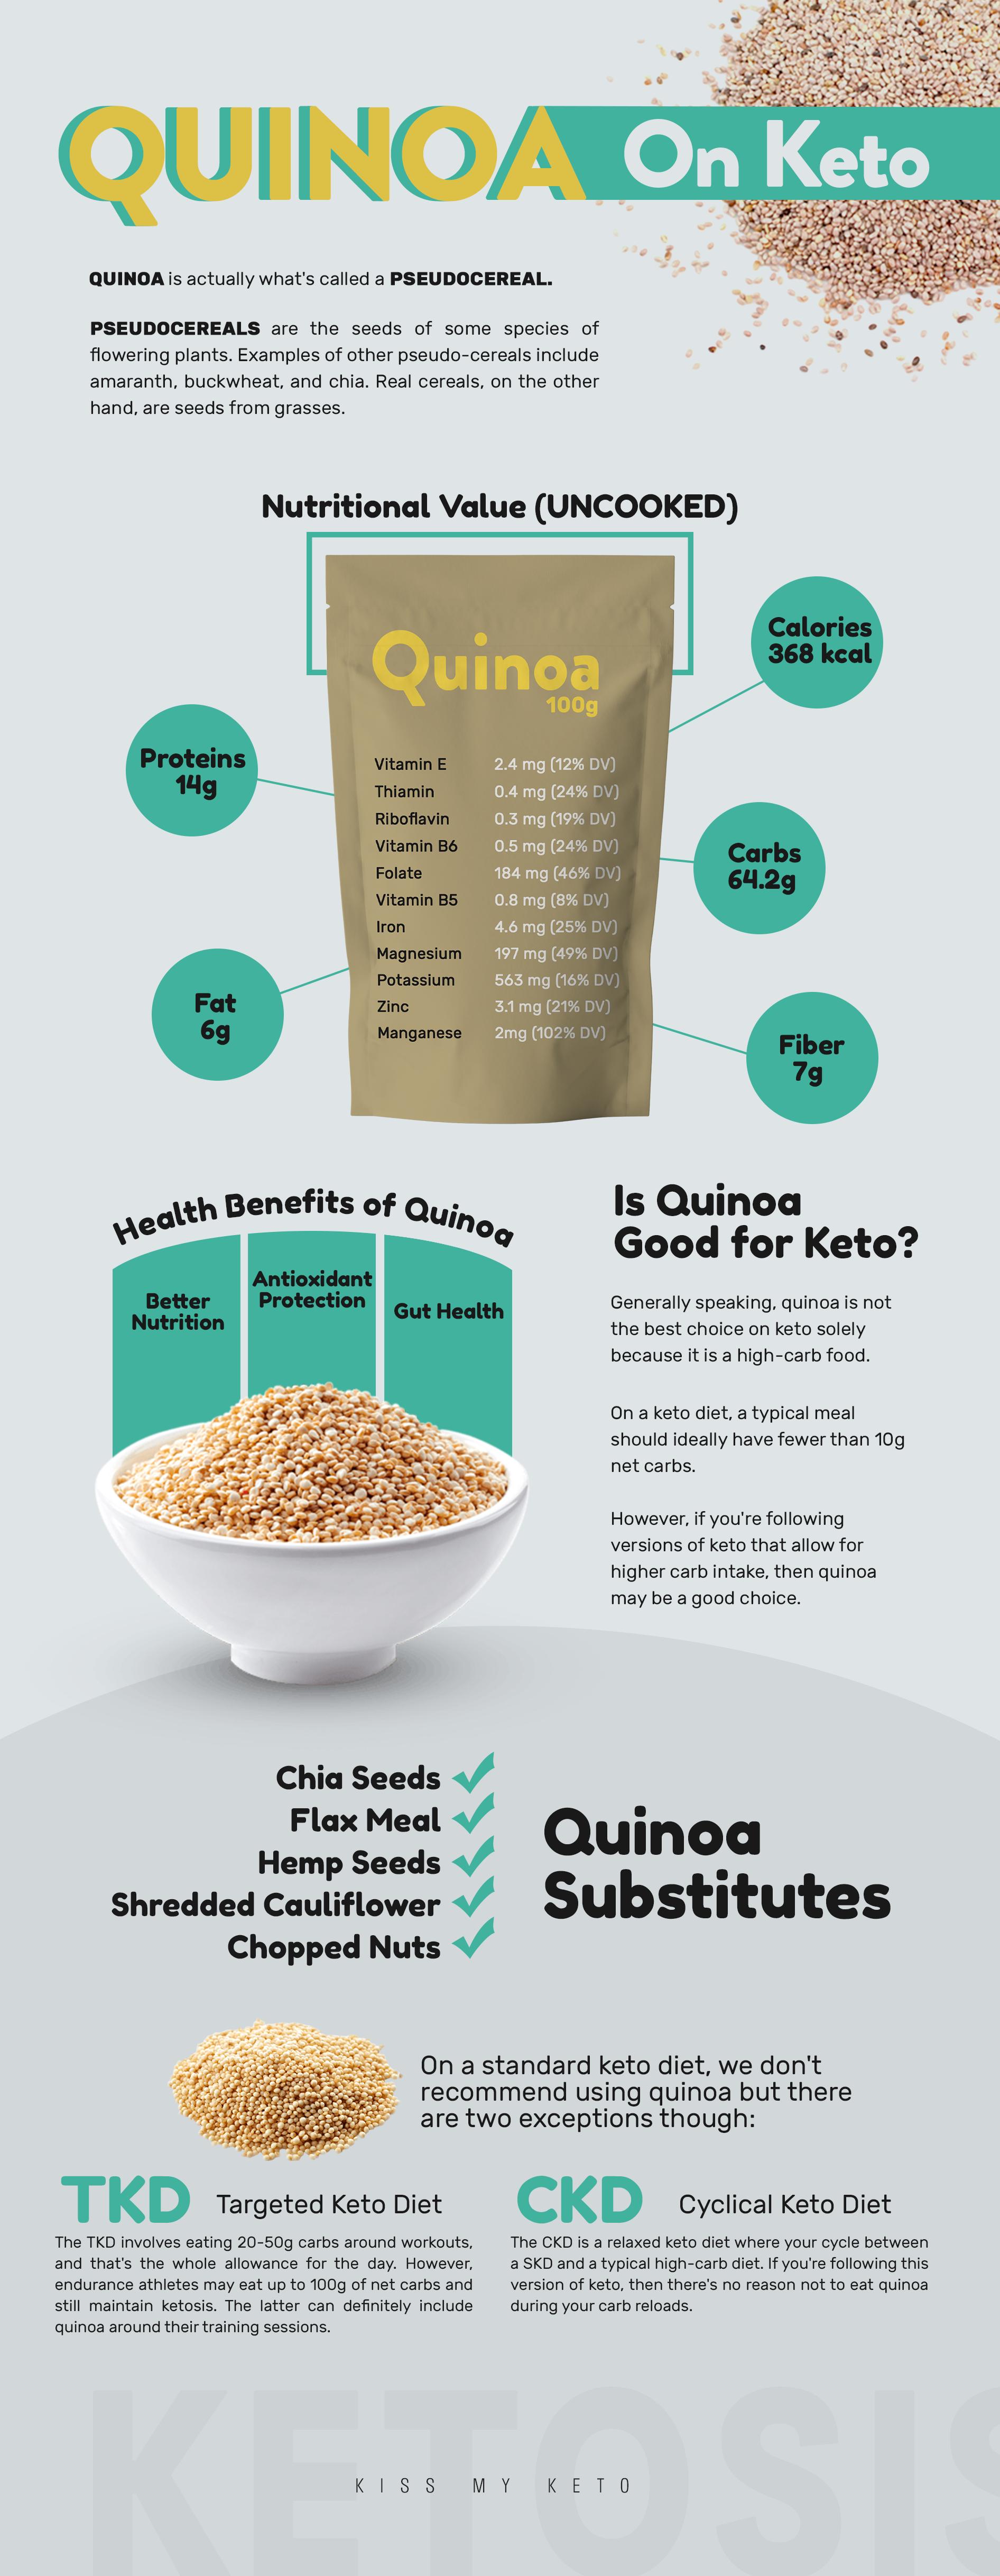 is quinoa ok on a ketosi diet